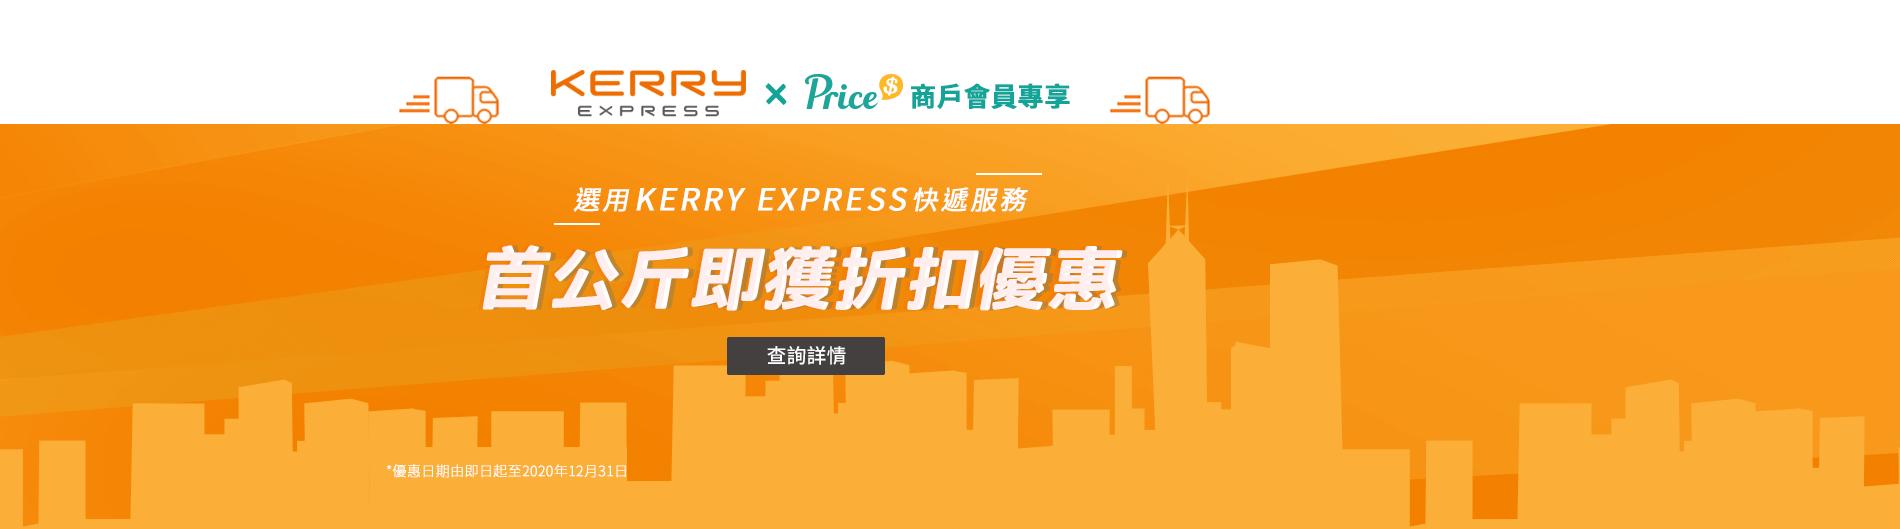 Price x Kerry Express嘉里快遞 商戶專享優惠